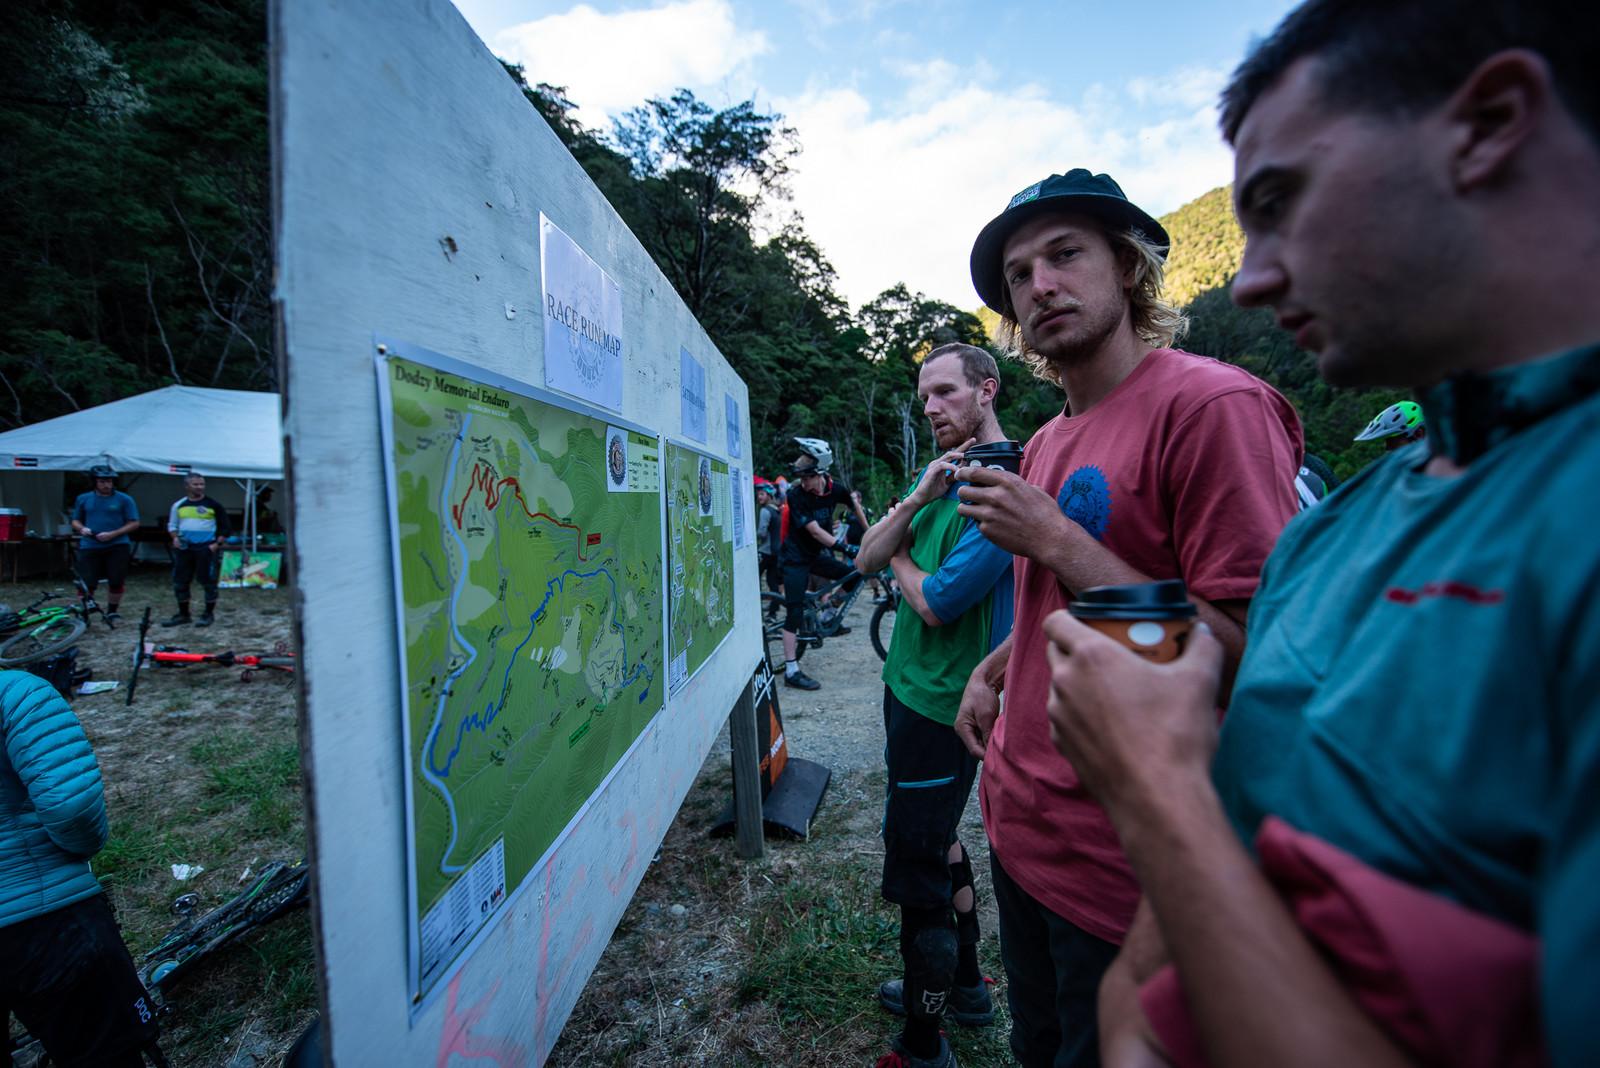 Sam Shaw - 2019 Dodzy Memorial Enduro - Mountain Biking Pictures - Vital MTB